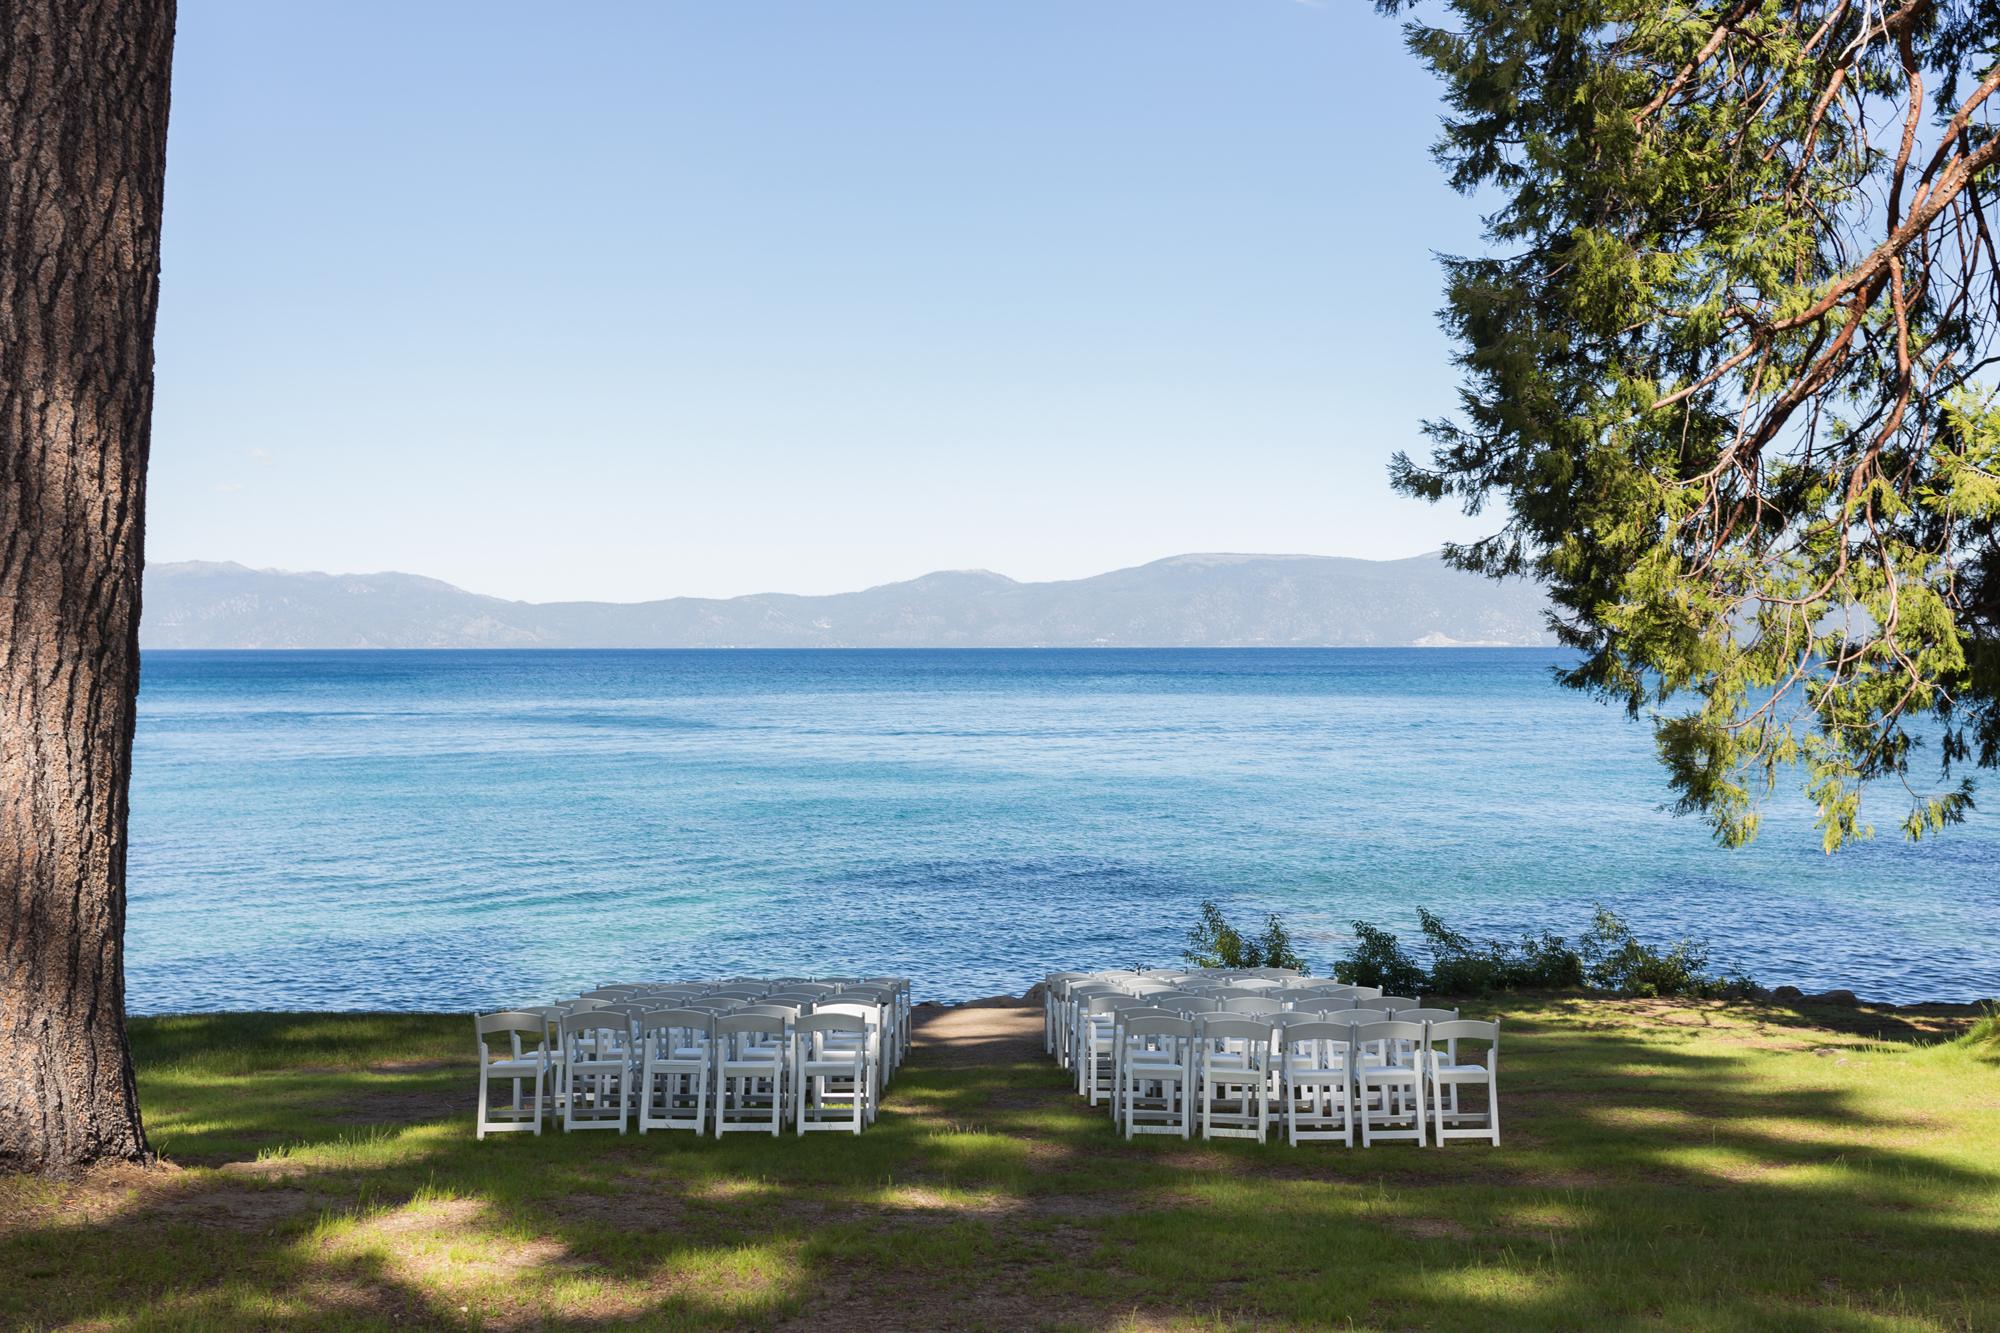 lake-tahoe-hellman-ehrman-mansion-wedding-lilouette-009.jpg